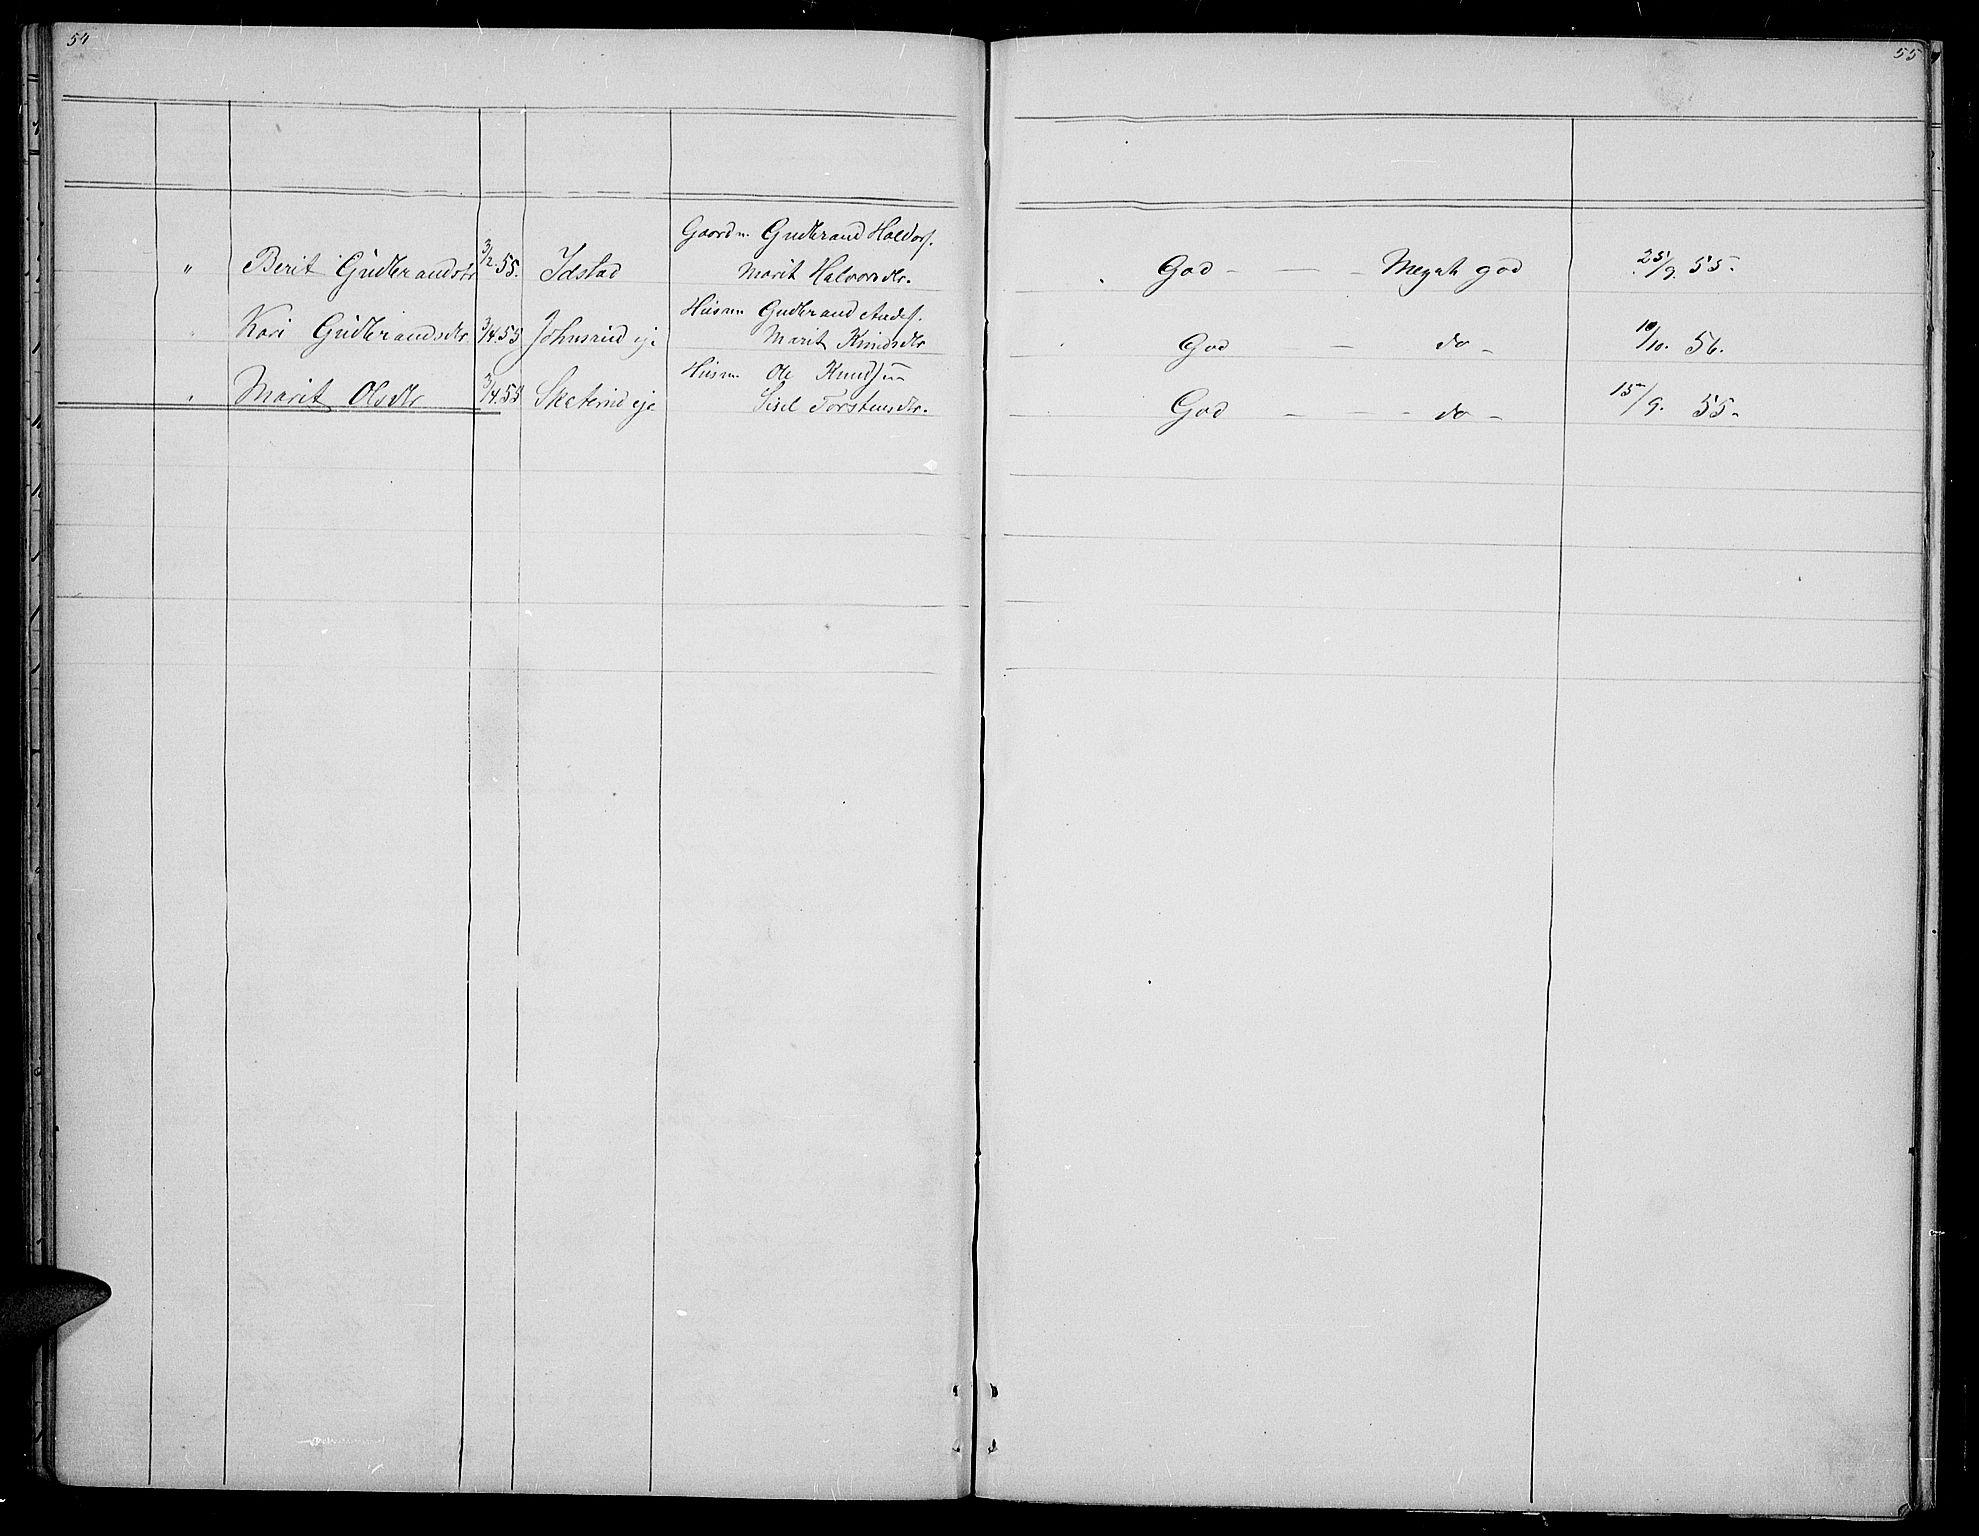 SAH, Øystre Slidre prestekontor, Klokkerbok nr. 2, 1866-1886, s. 54-55